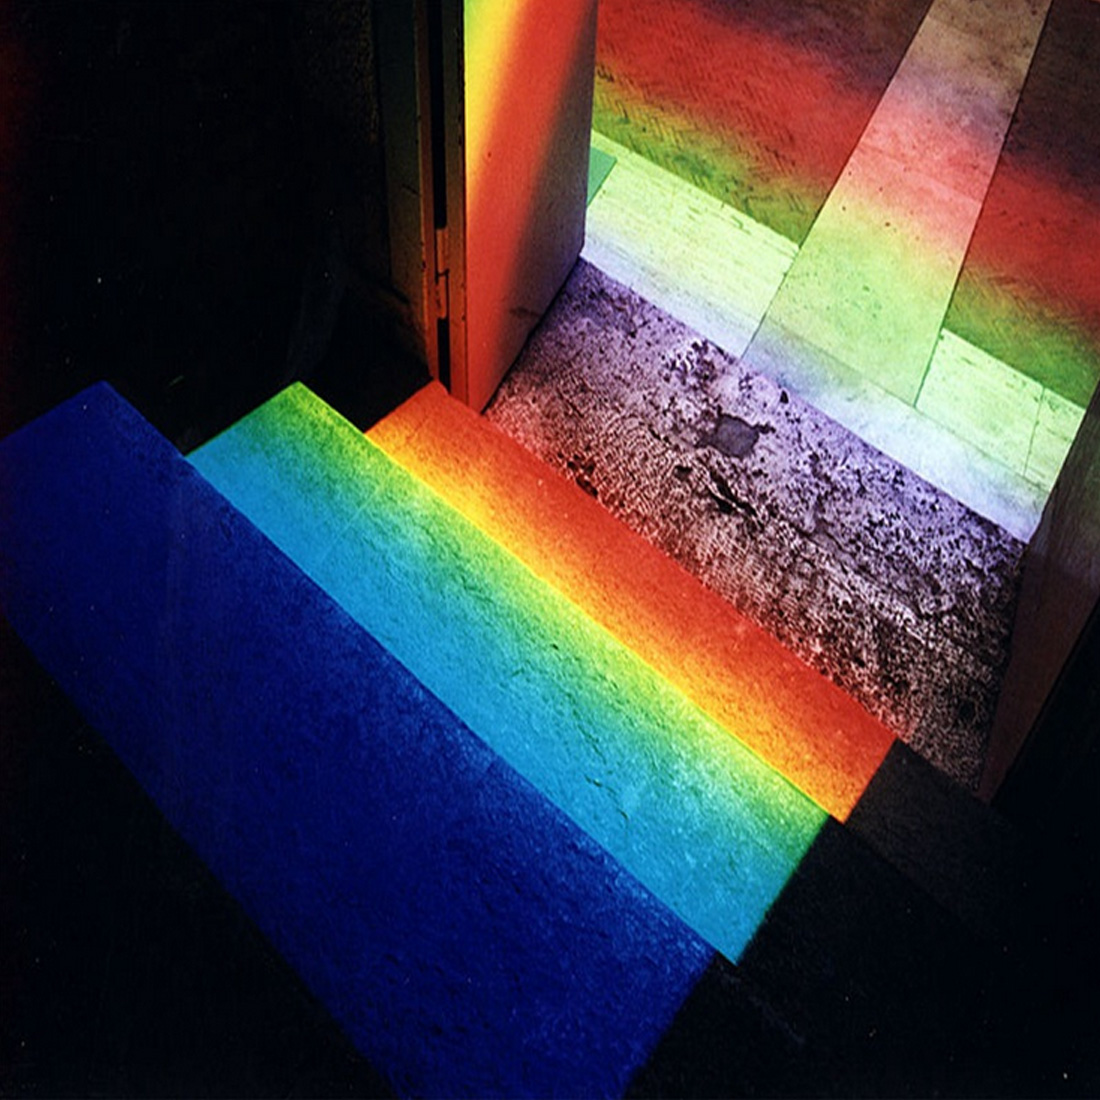 15cmx3cm Rainbow Optical Glass Triple Triangular Prism Physics Teaching SHIP US